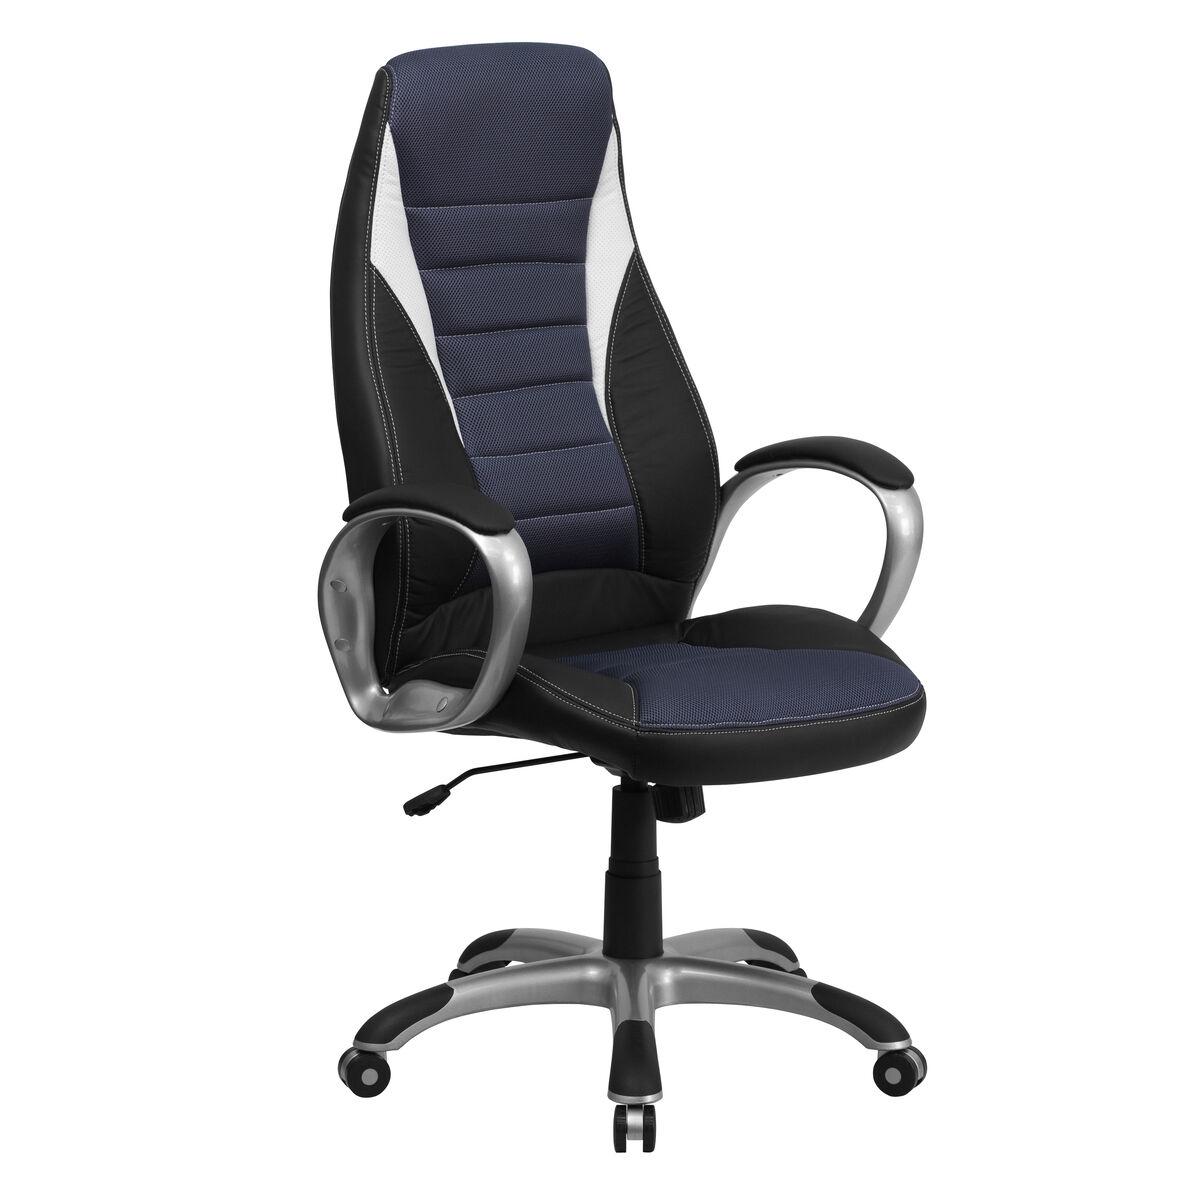 Flash furniture ch cx0243h sat gg for H furniture ww chair